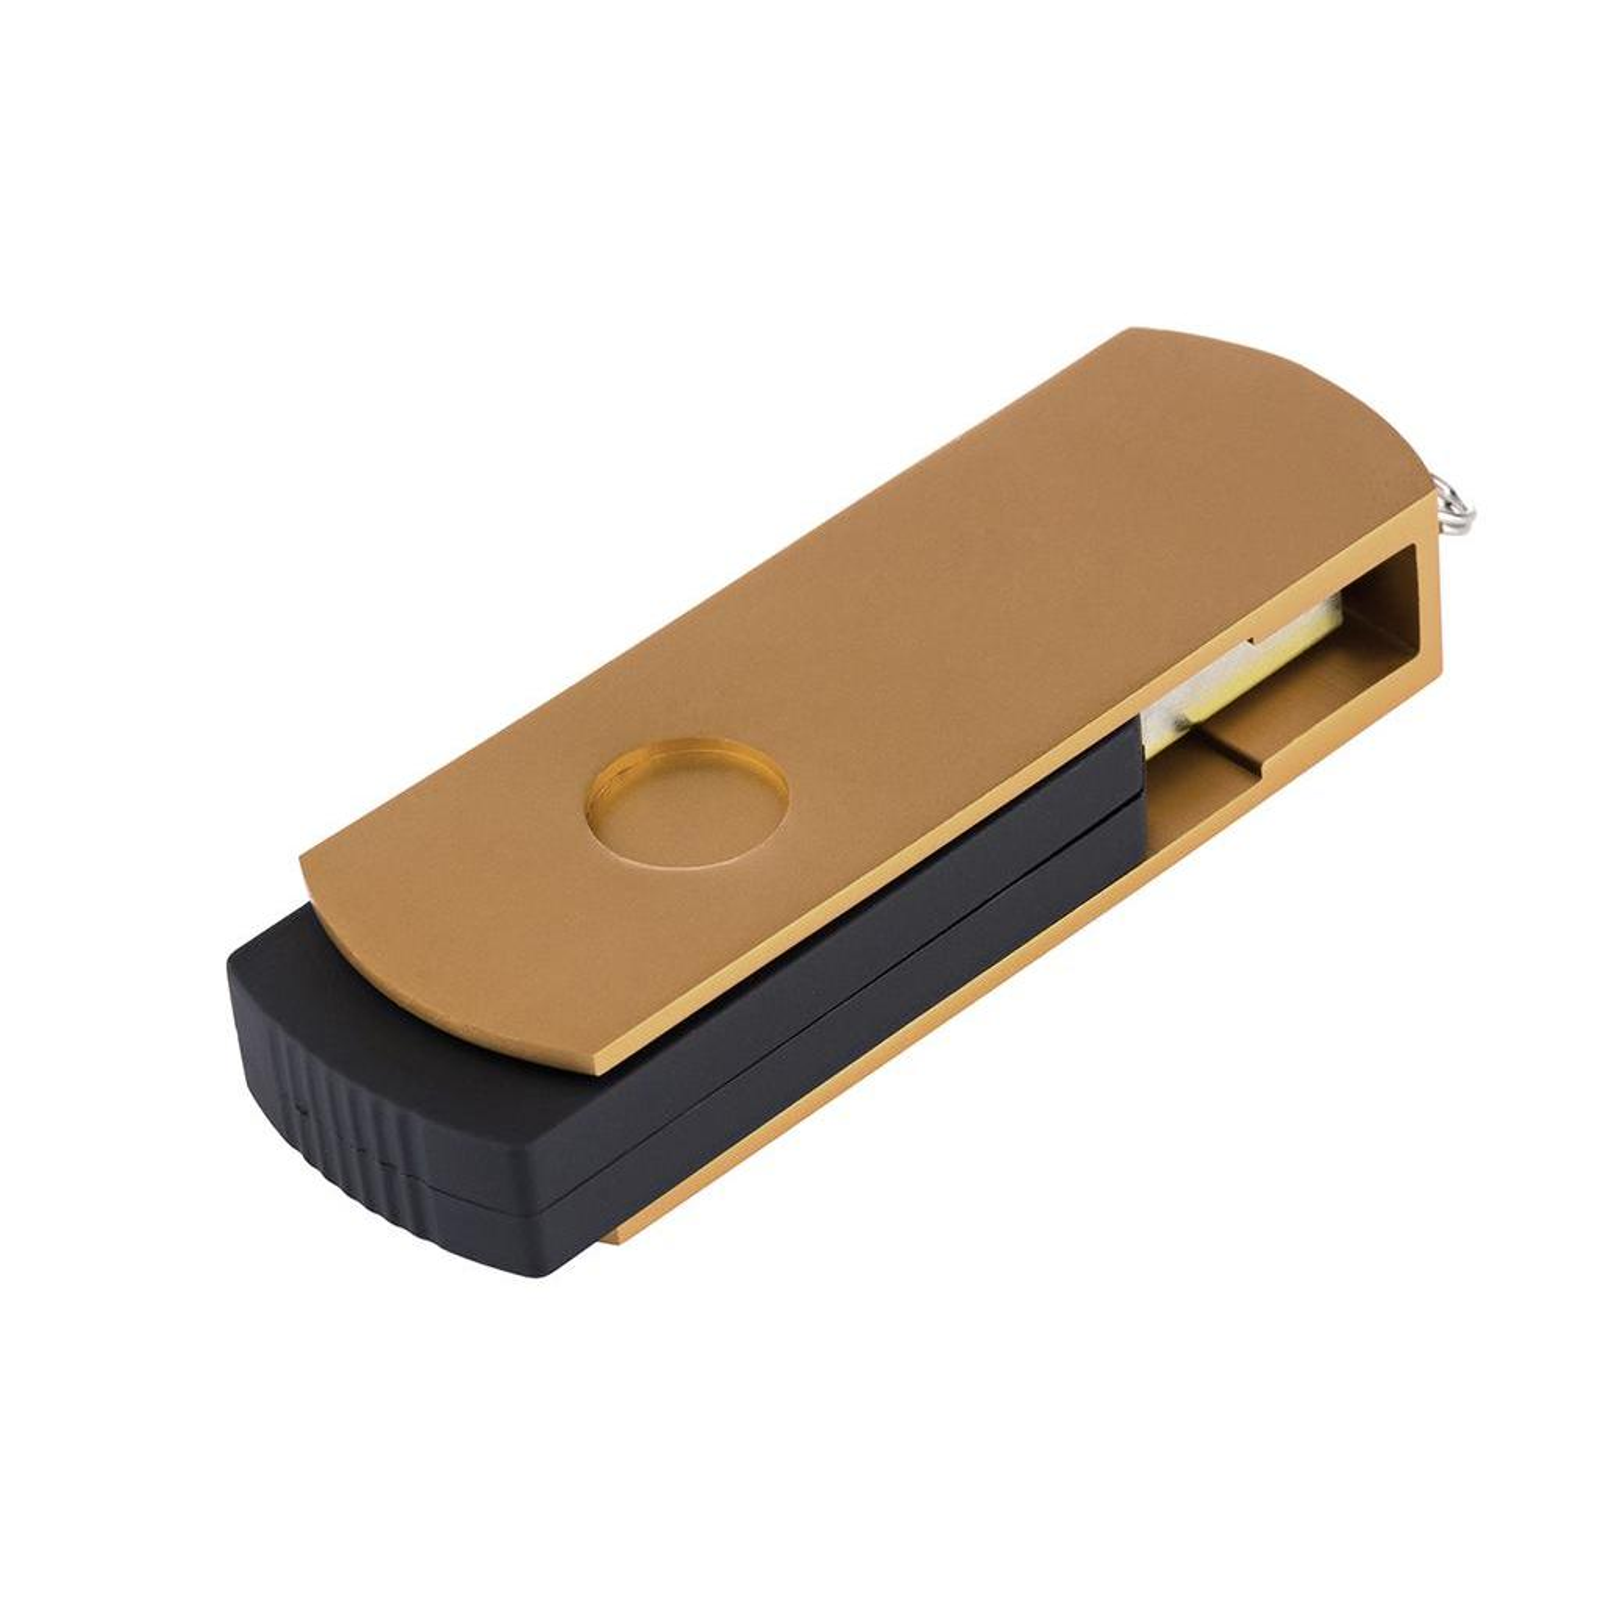 USB флеш накопитель eXceleram 32GB P2 Series Black/Black USB 3.1 Gen 1 (EXP2U3BB32) изображение 6